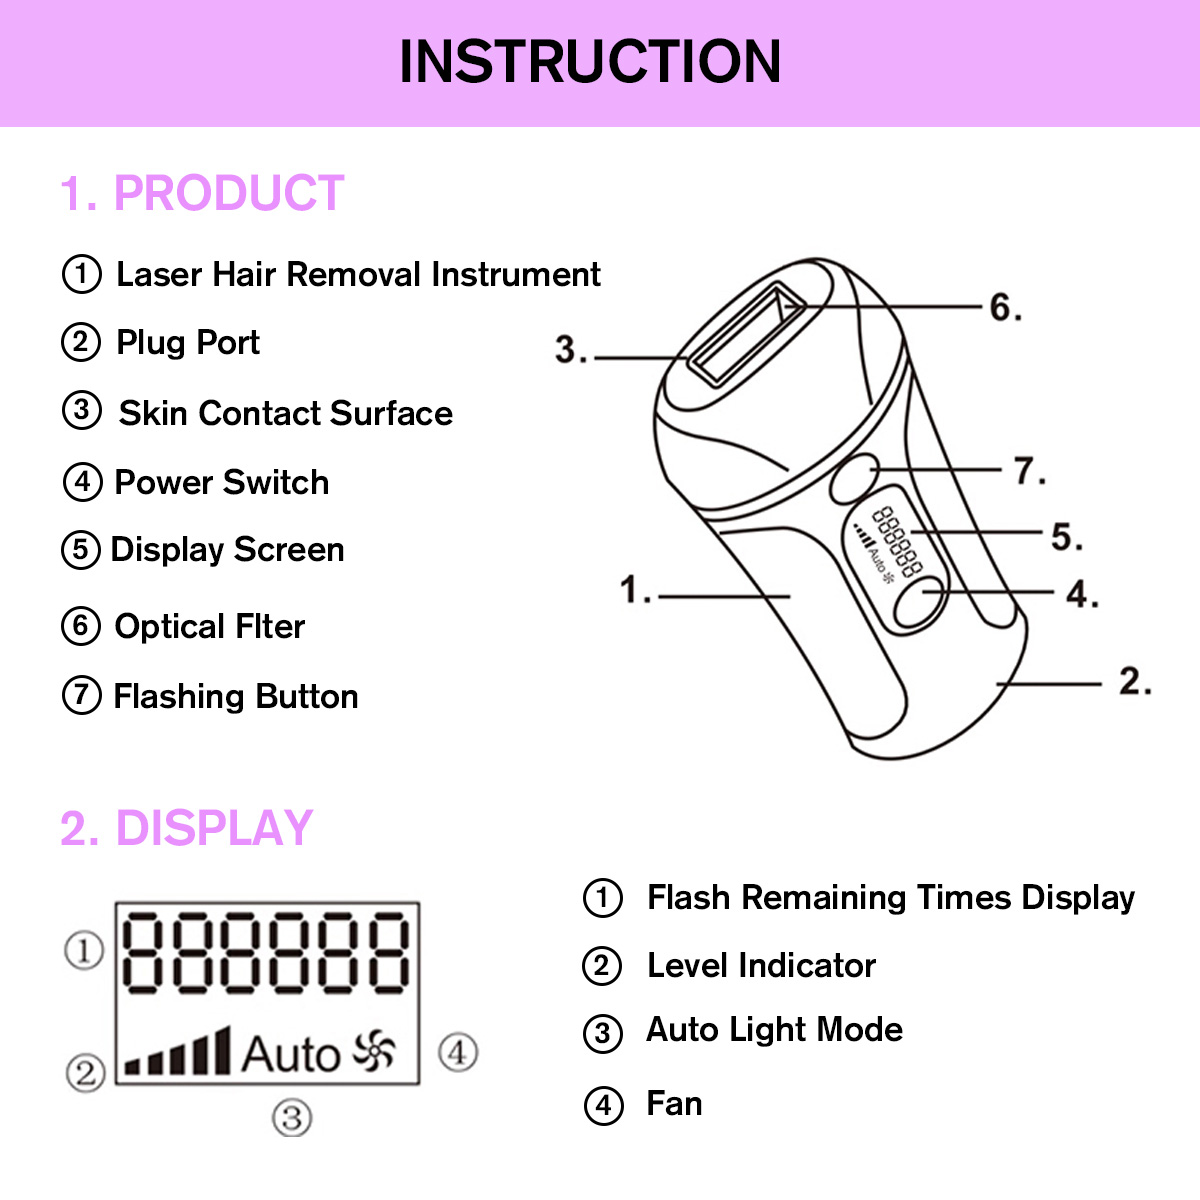 depilacao laser display lcd biquini indolor removedor cabelo maquina 04